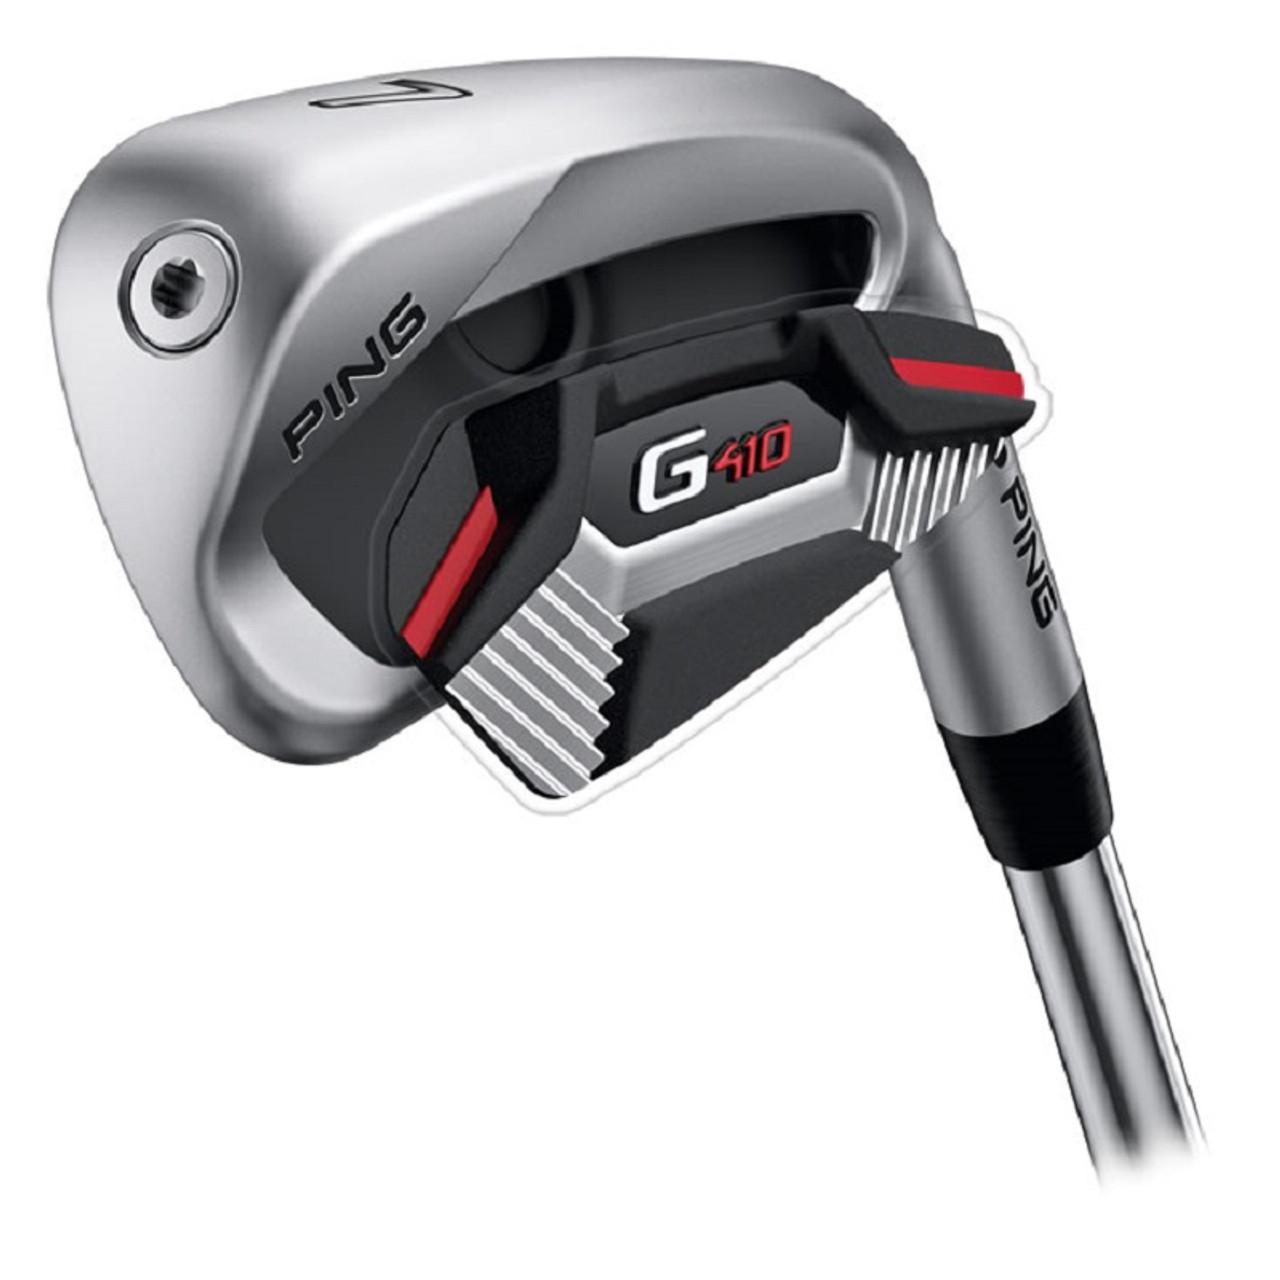 Ping G410 Iron Sets